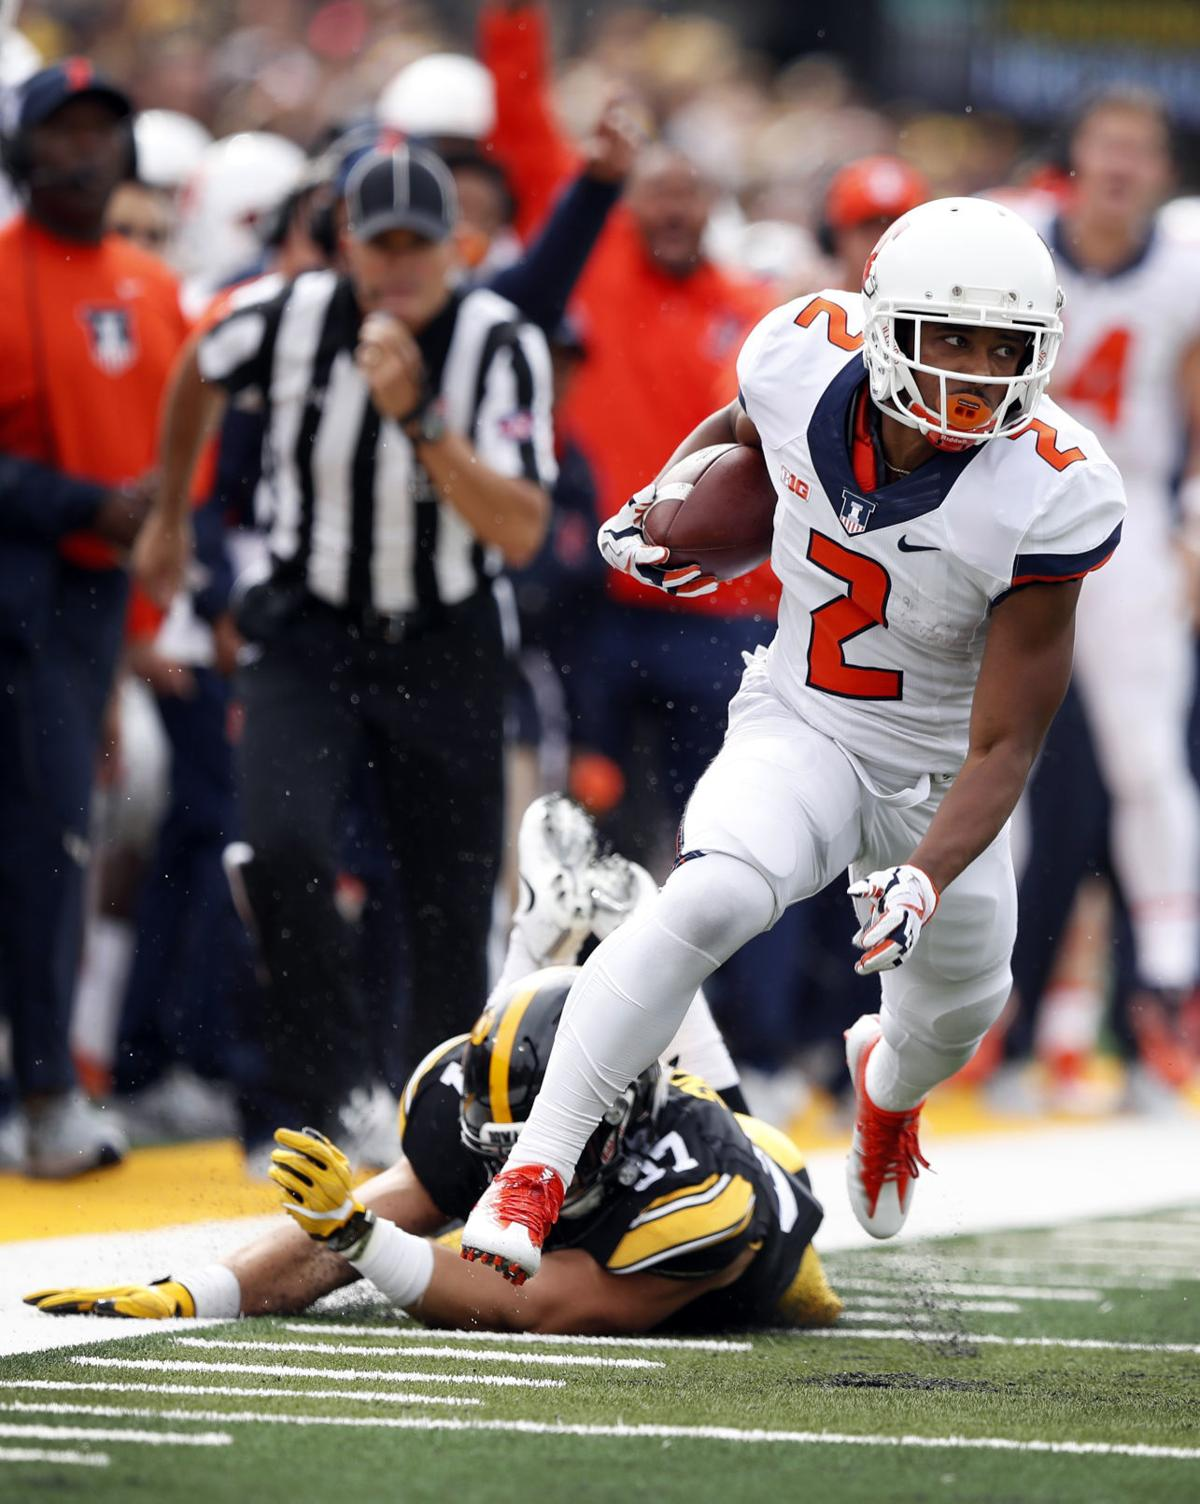 Illinois-Rushing Attack Football